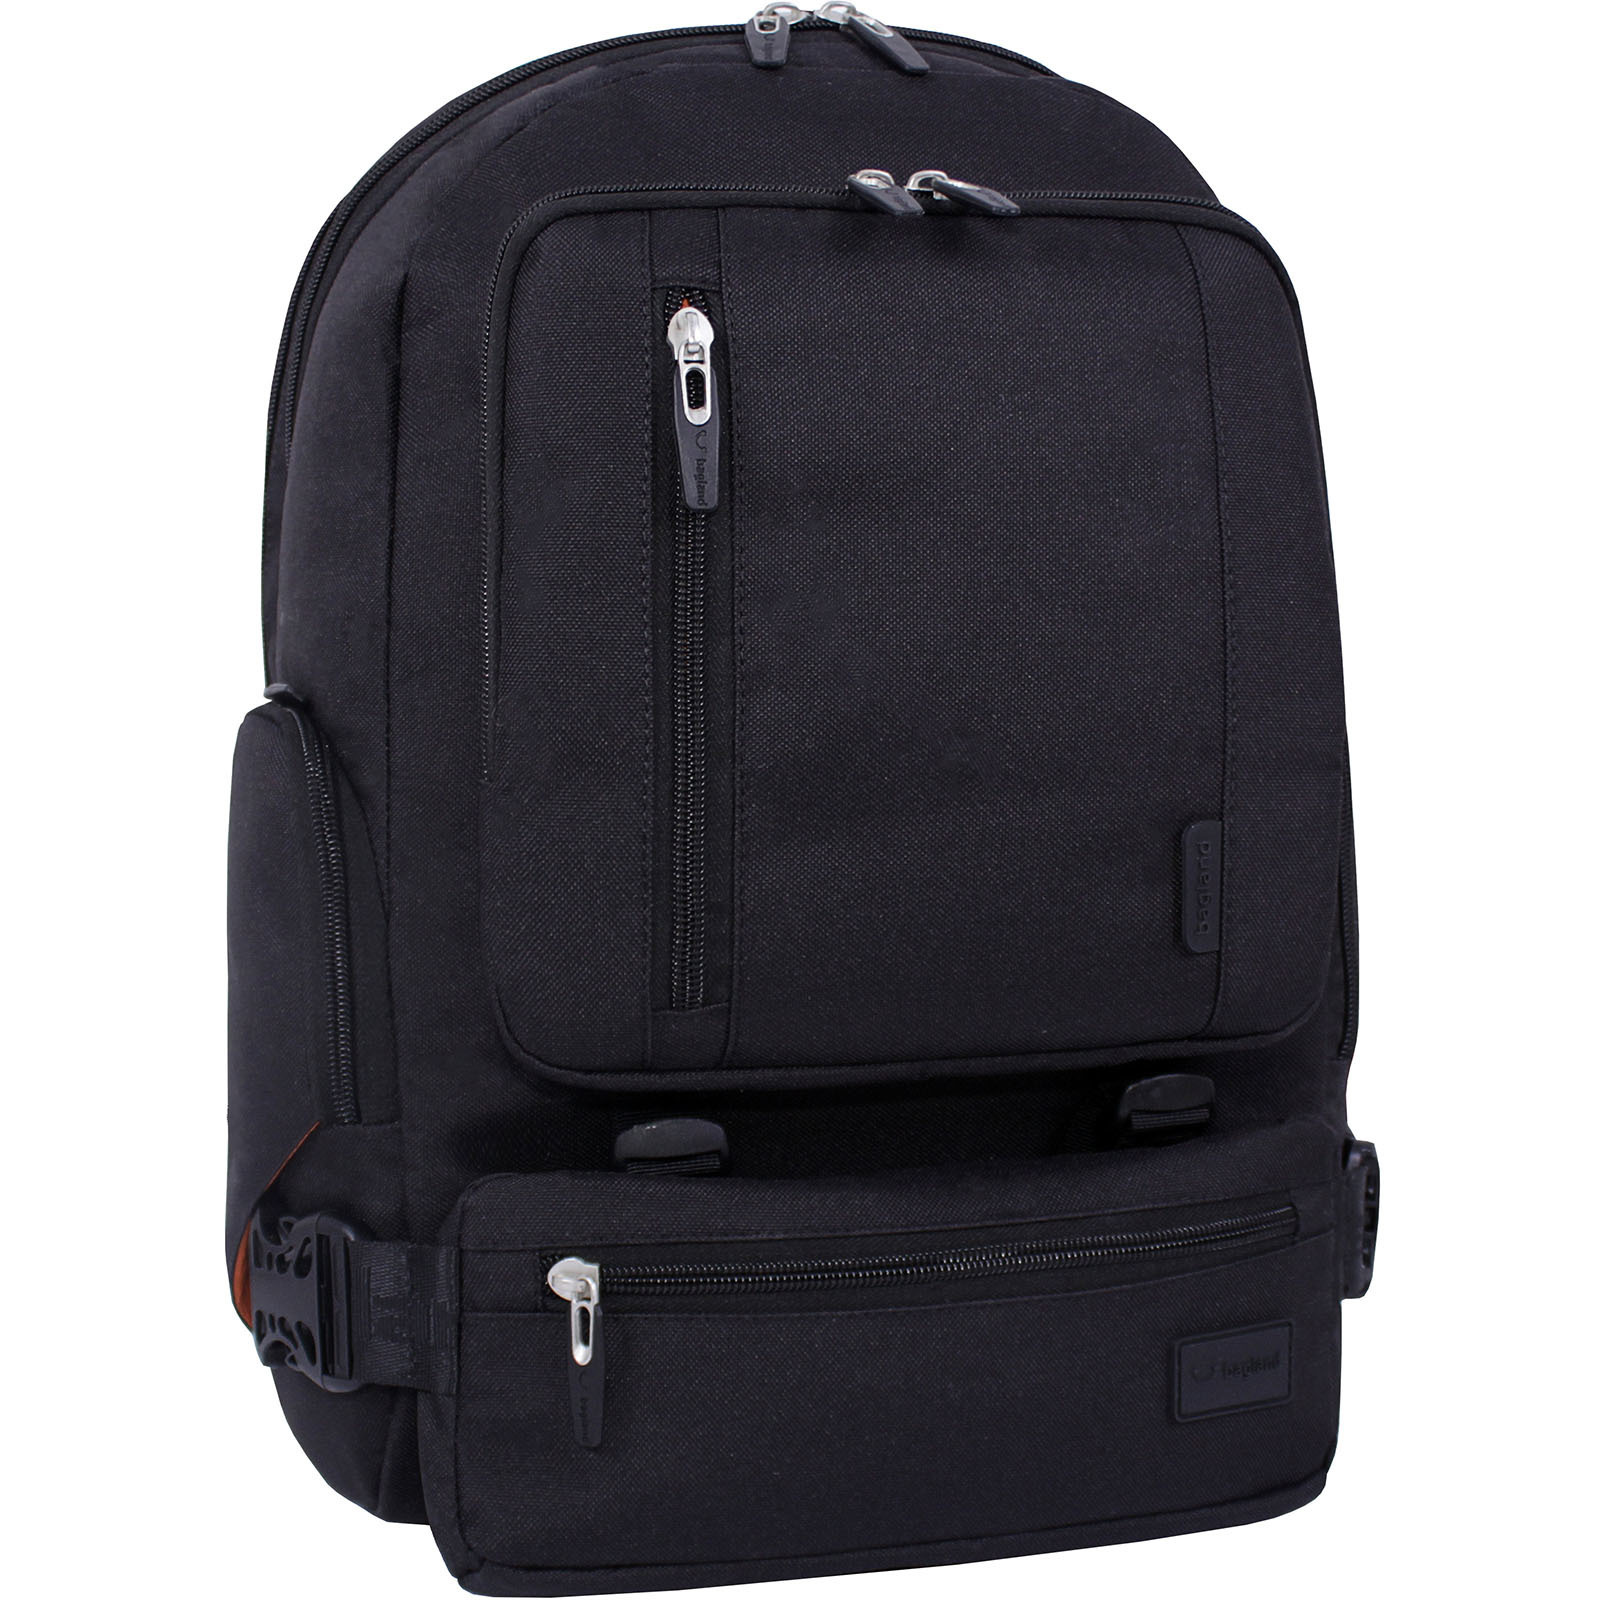 Мужские рюкзаки Рюкзак Bagland Frank 26 л. черный (0059566) IMG_0853.JPG